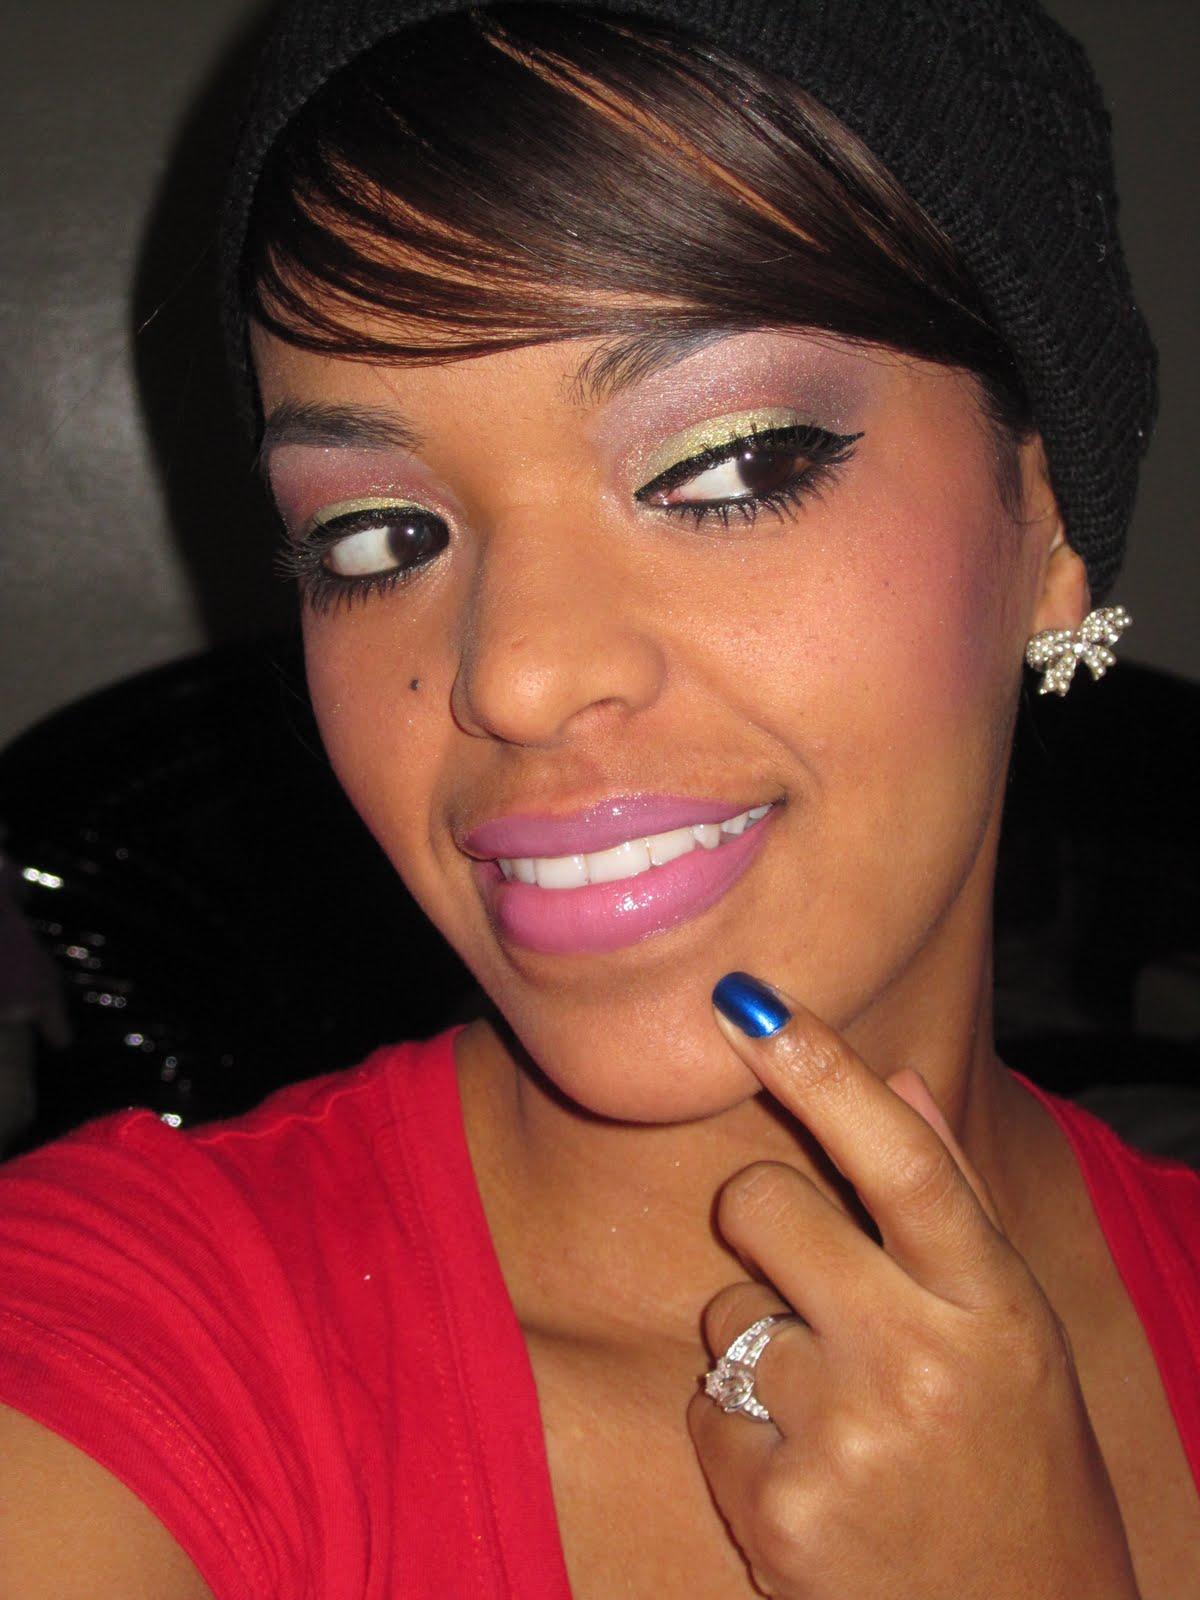 Glamour + Fashion & everything pink: KAT VON D tattoo concealer RAVE!!